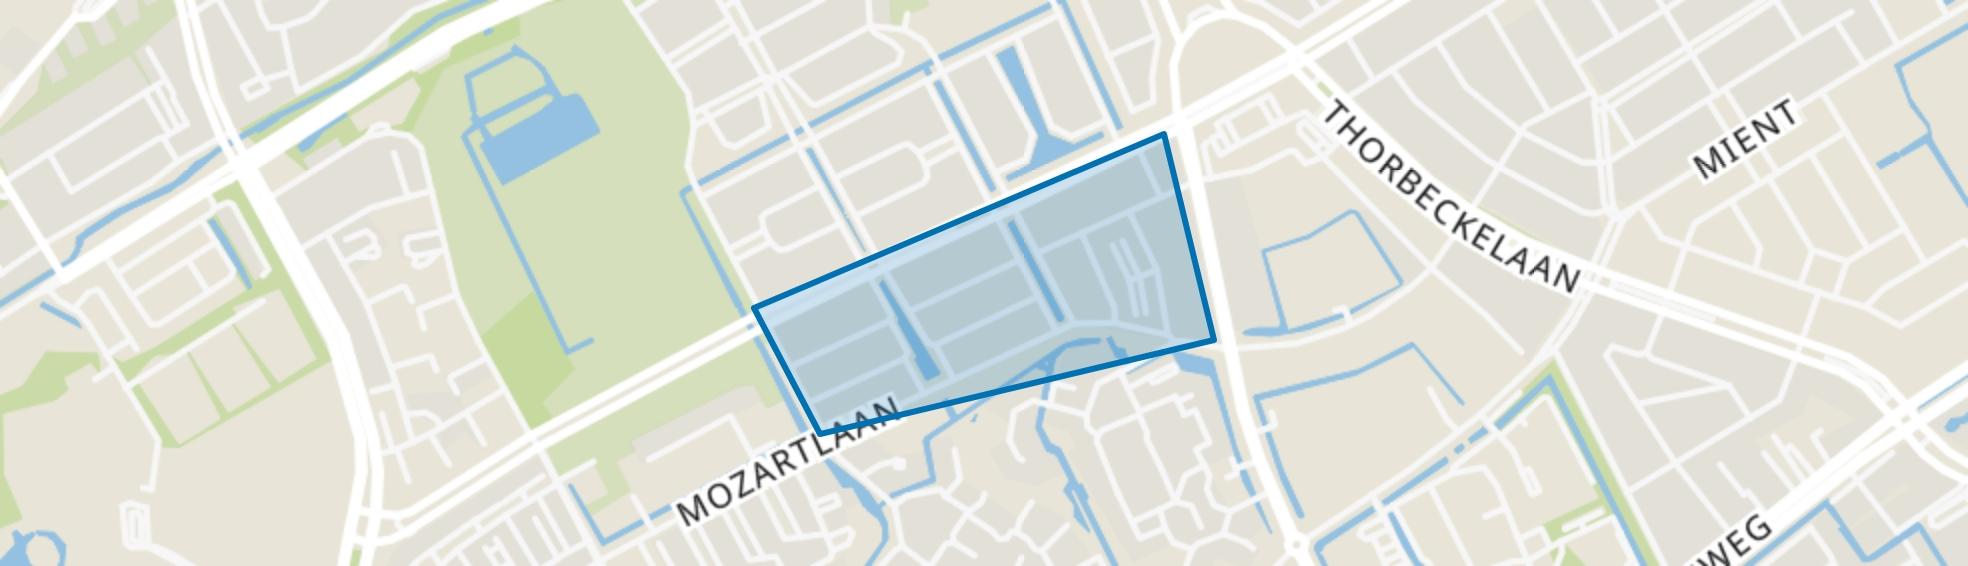 Componistenbuurt, Den Haag map